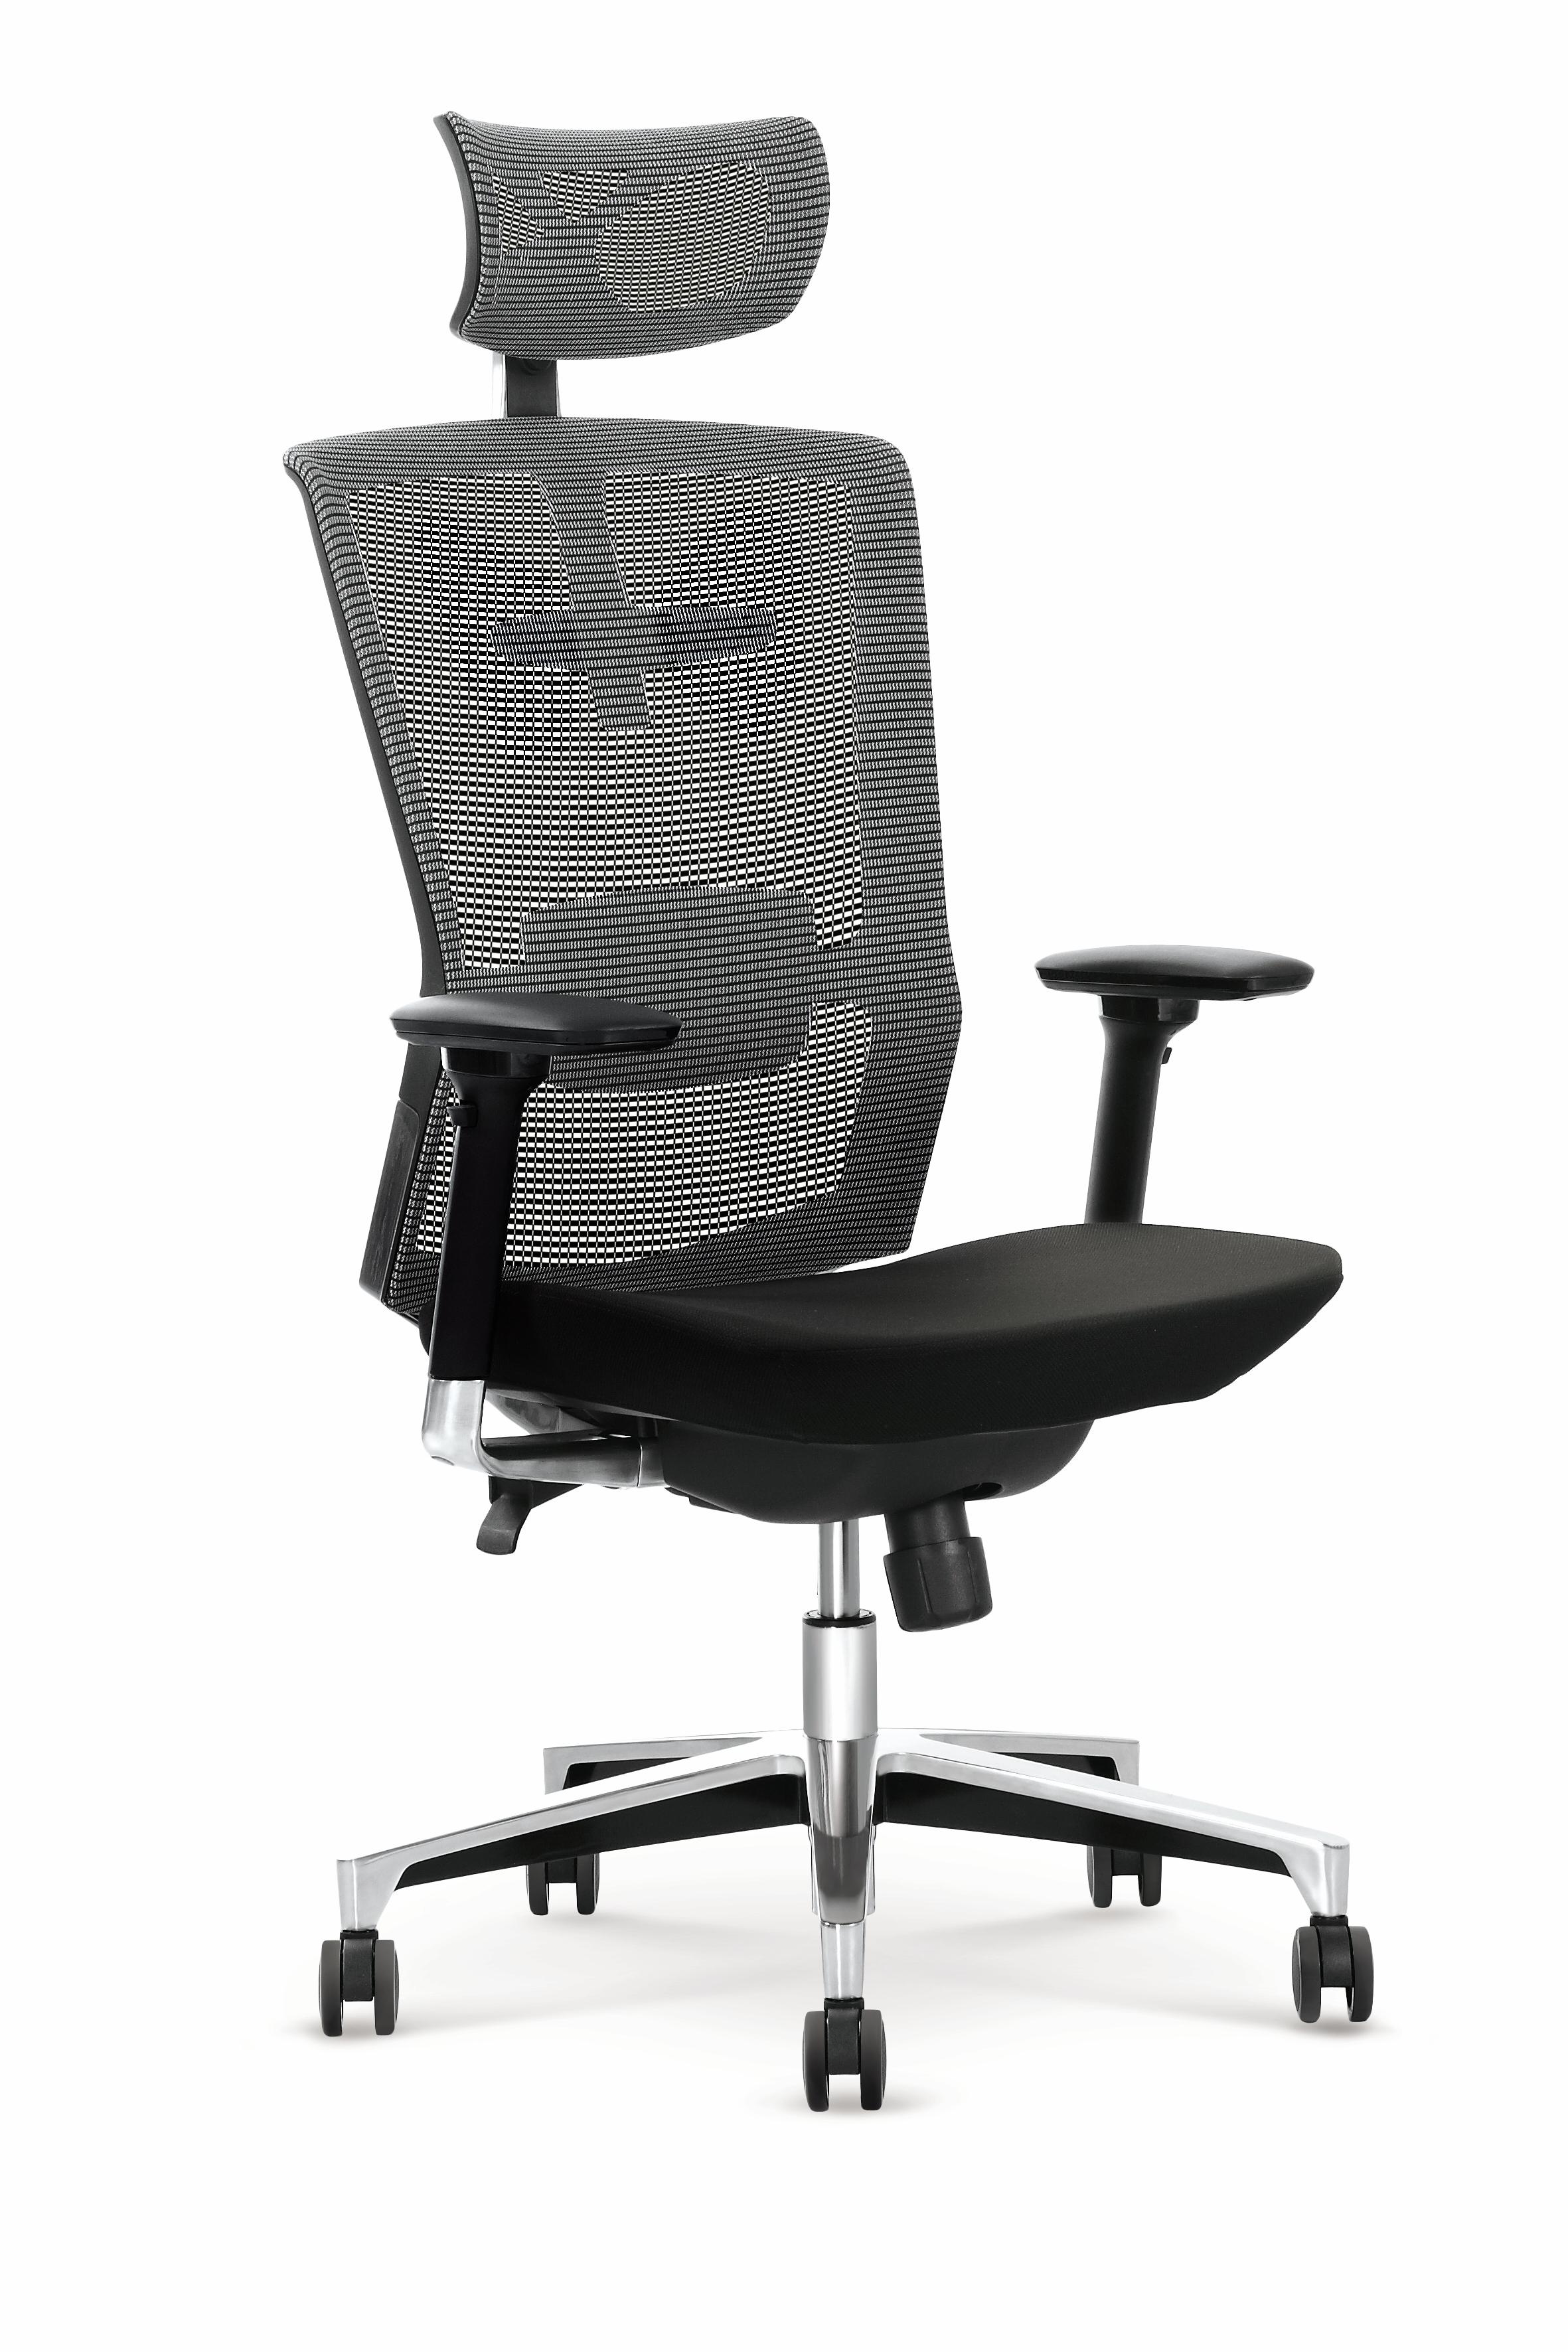 Scaun de birou ergonomic tapitat cu stofa Ambasador Gri / Negru, l64xA63xH120-130 cm